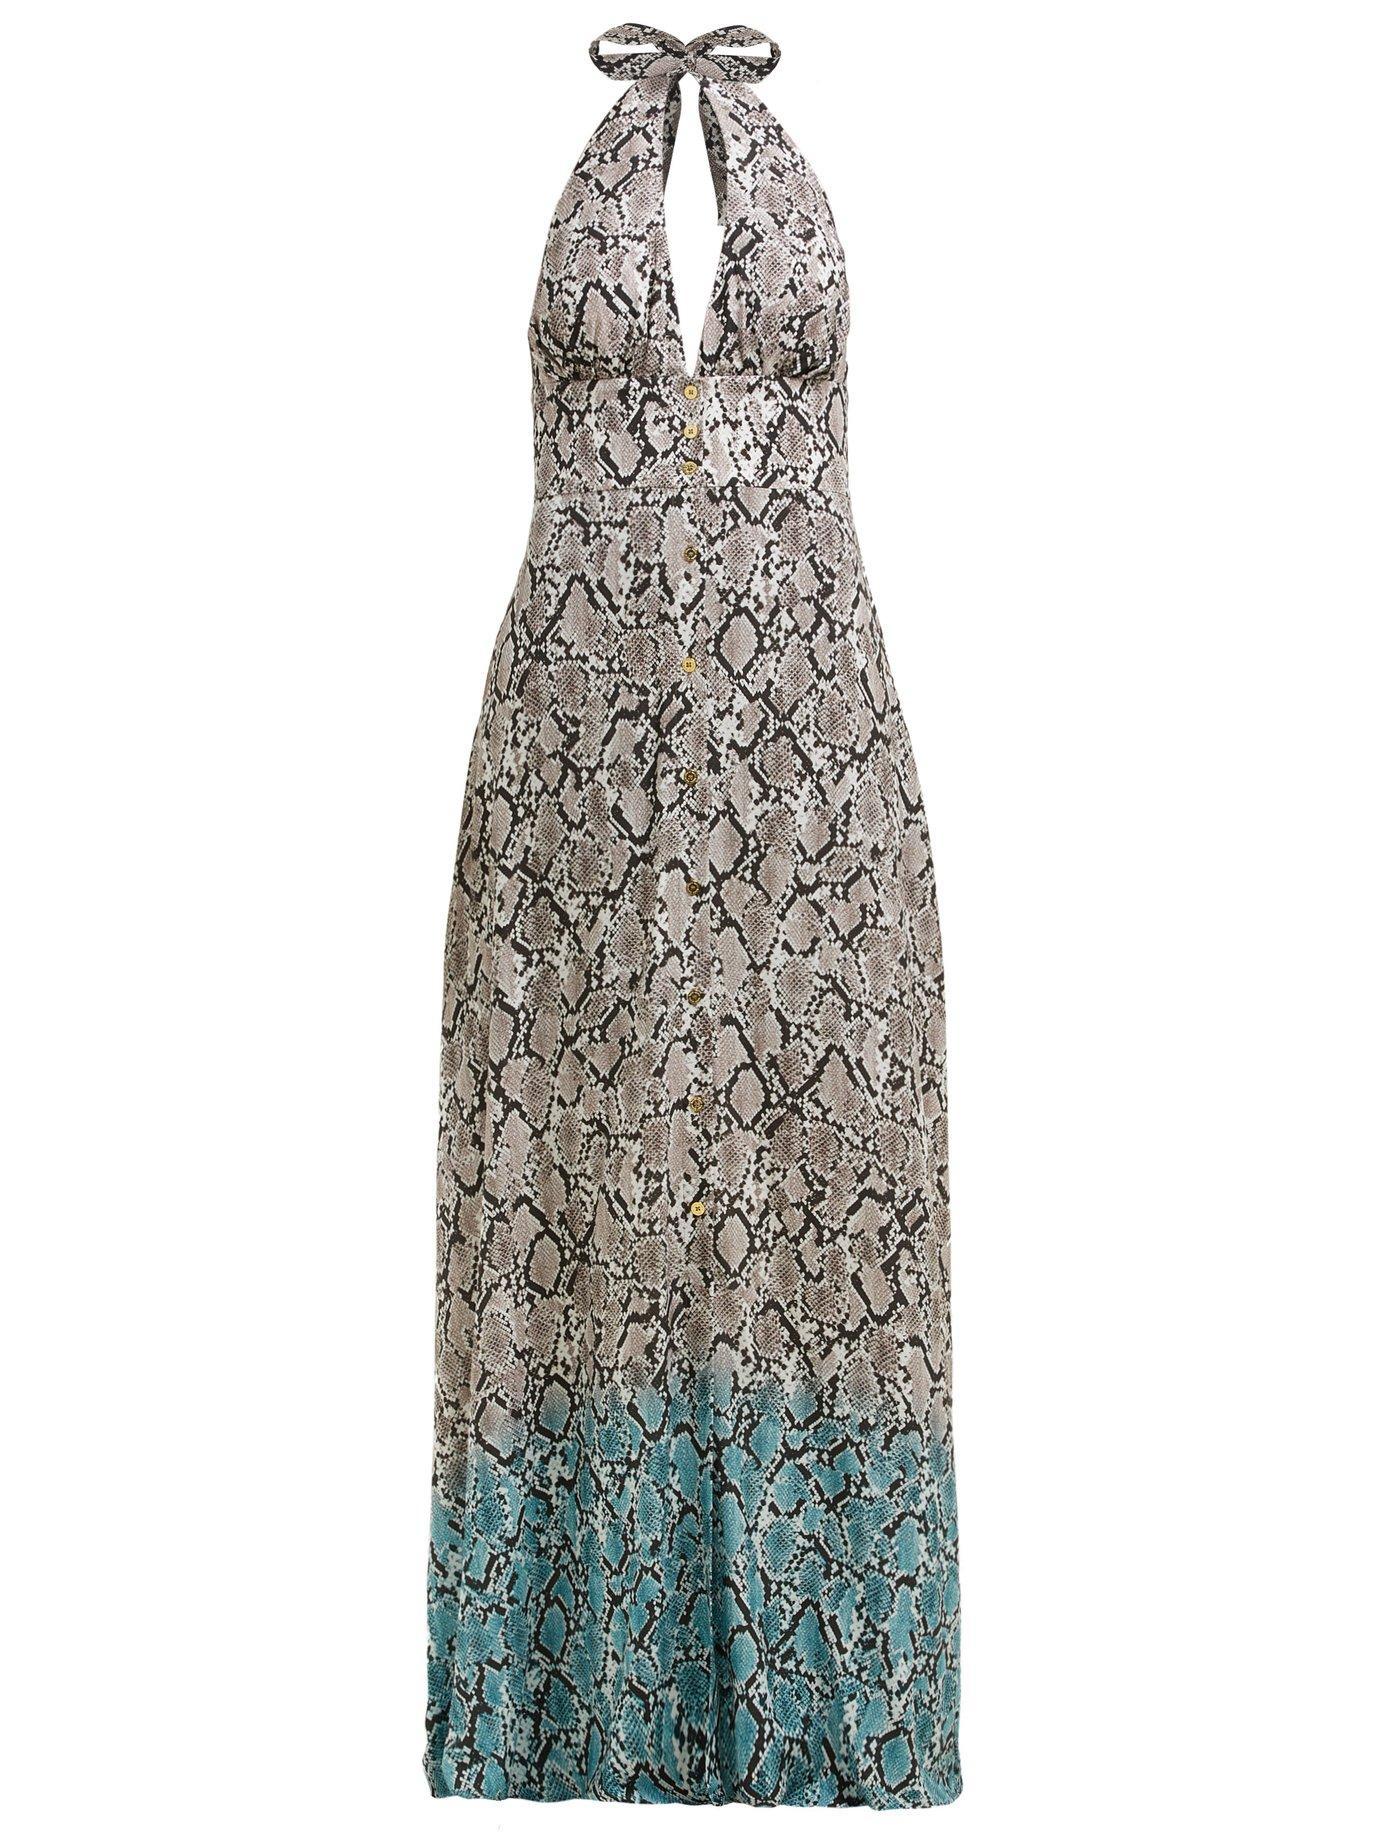 02dfe478da Heidi Klein. Women's Mozambique Snakeskin Print Maxi Dress